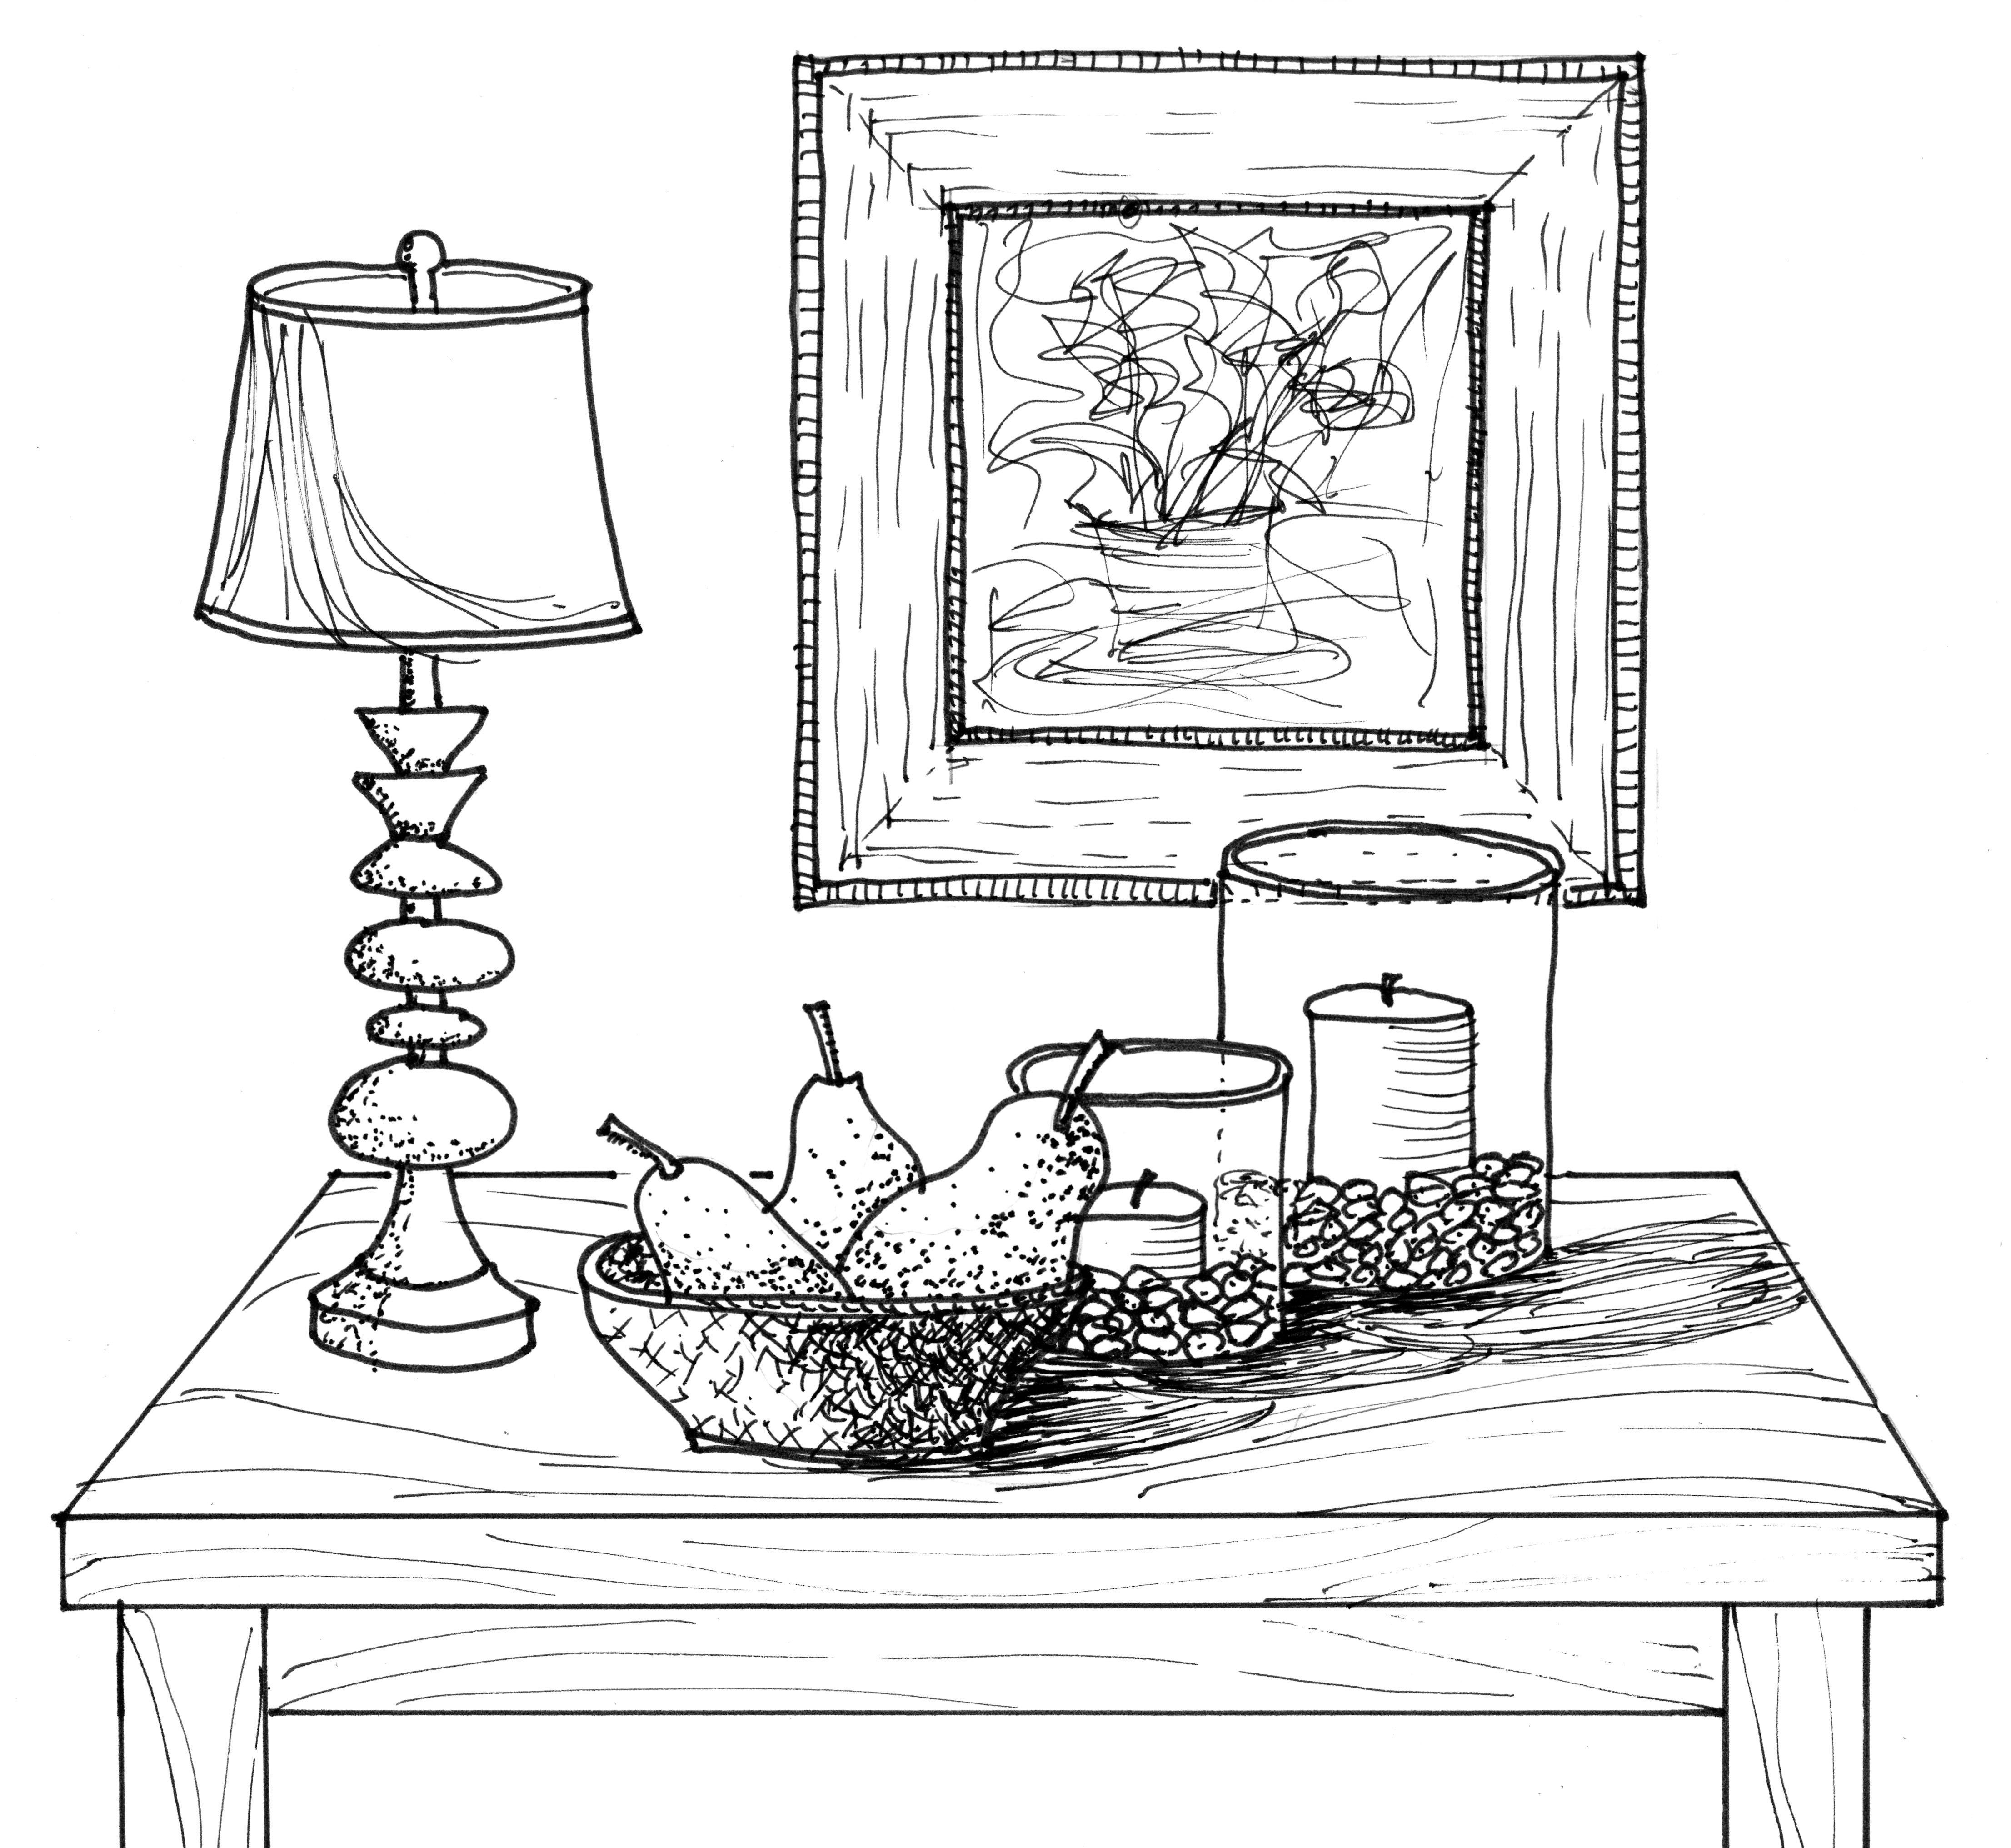 table lamp drawing at getdrawings com